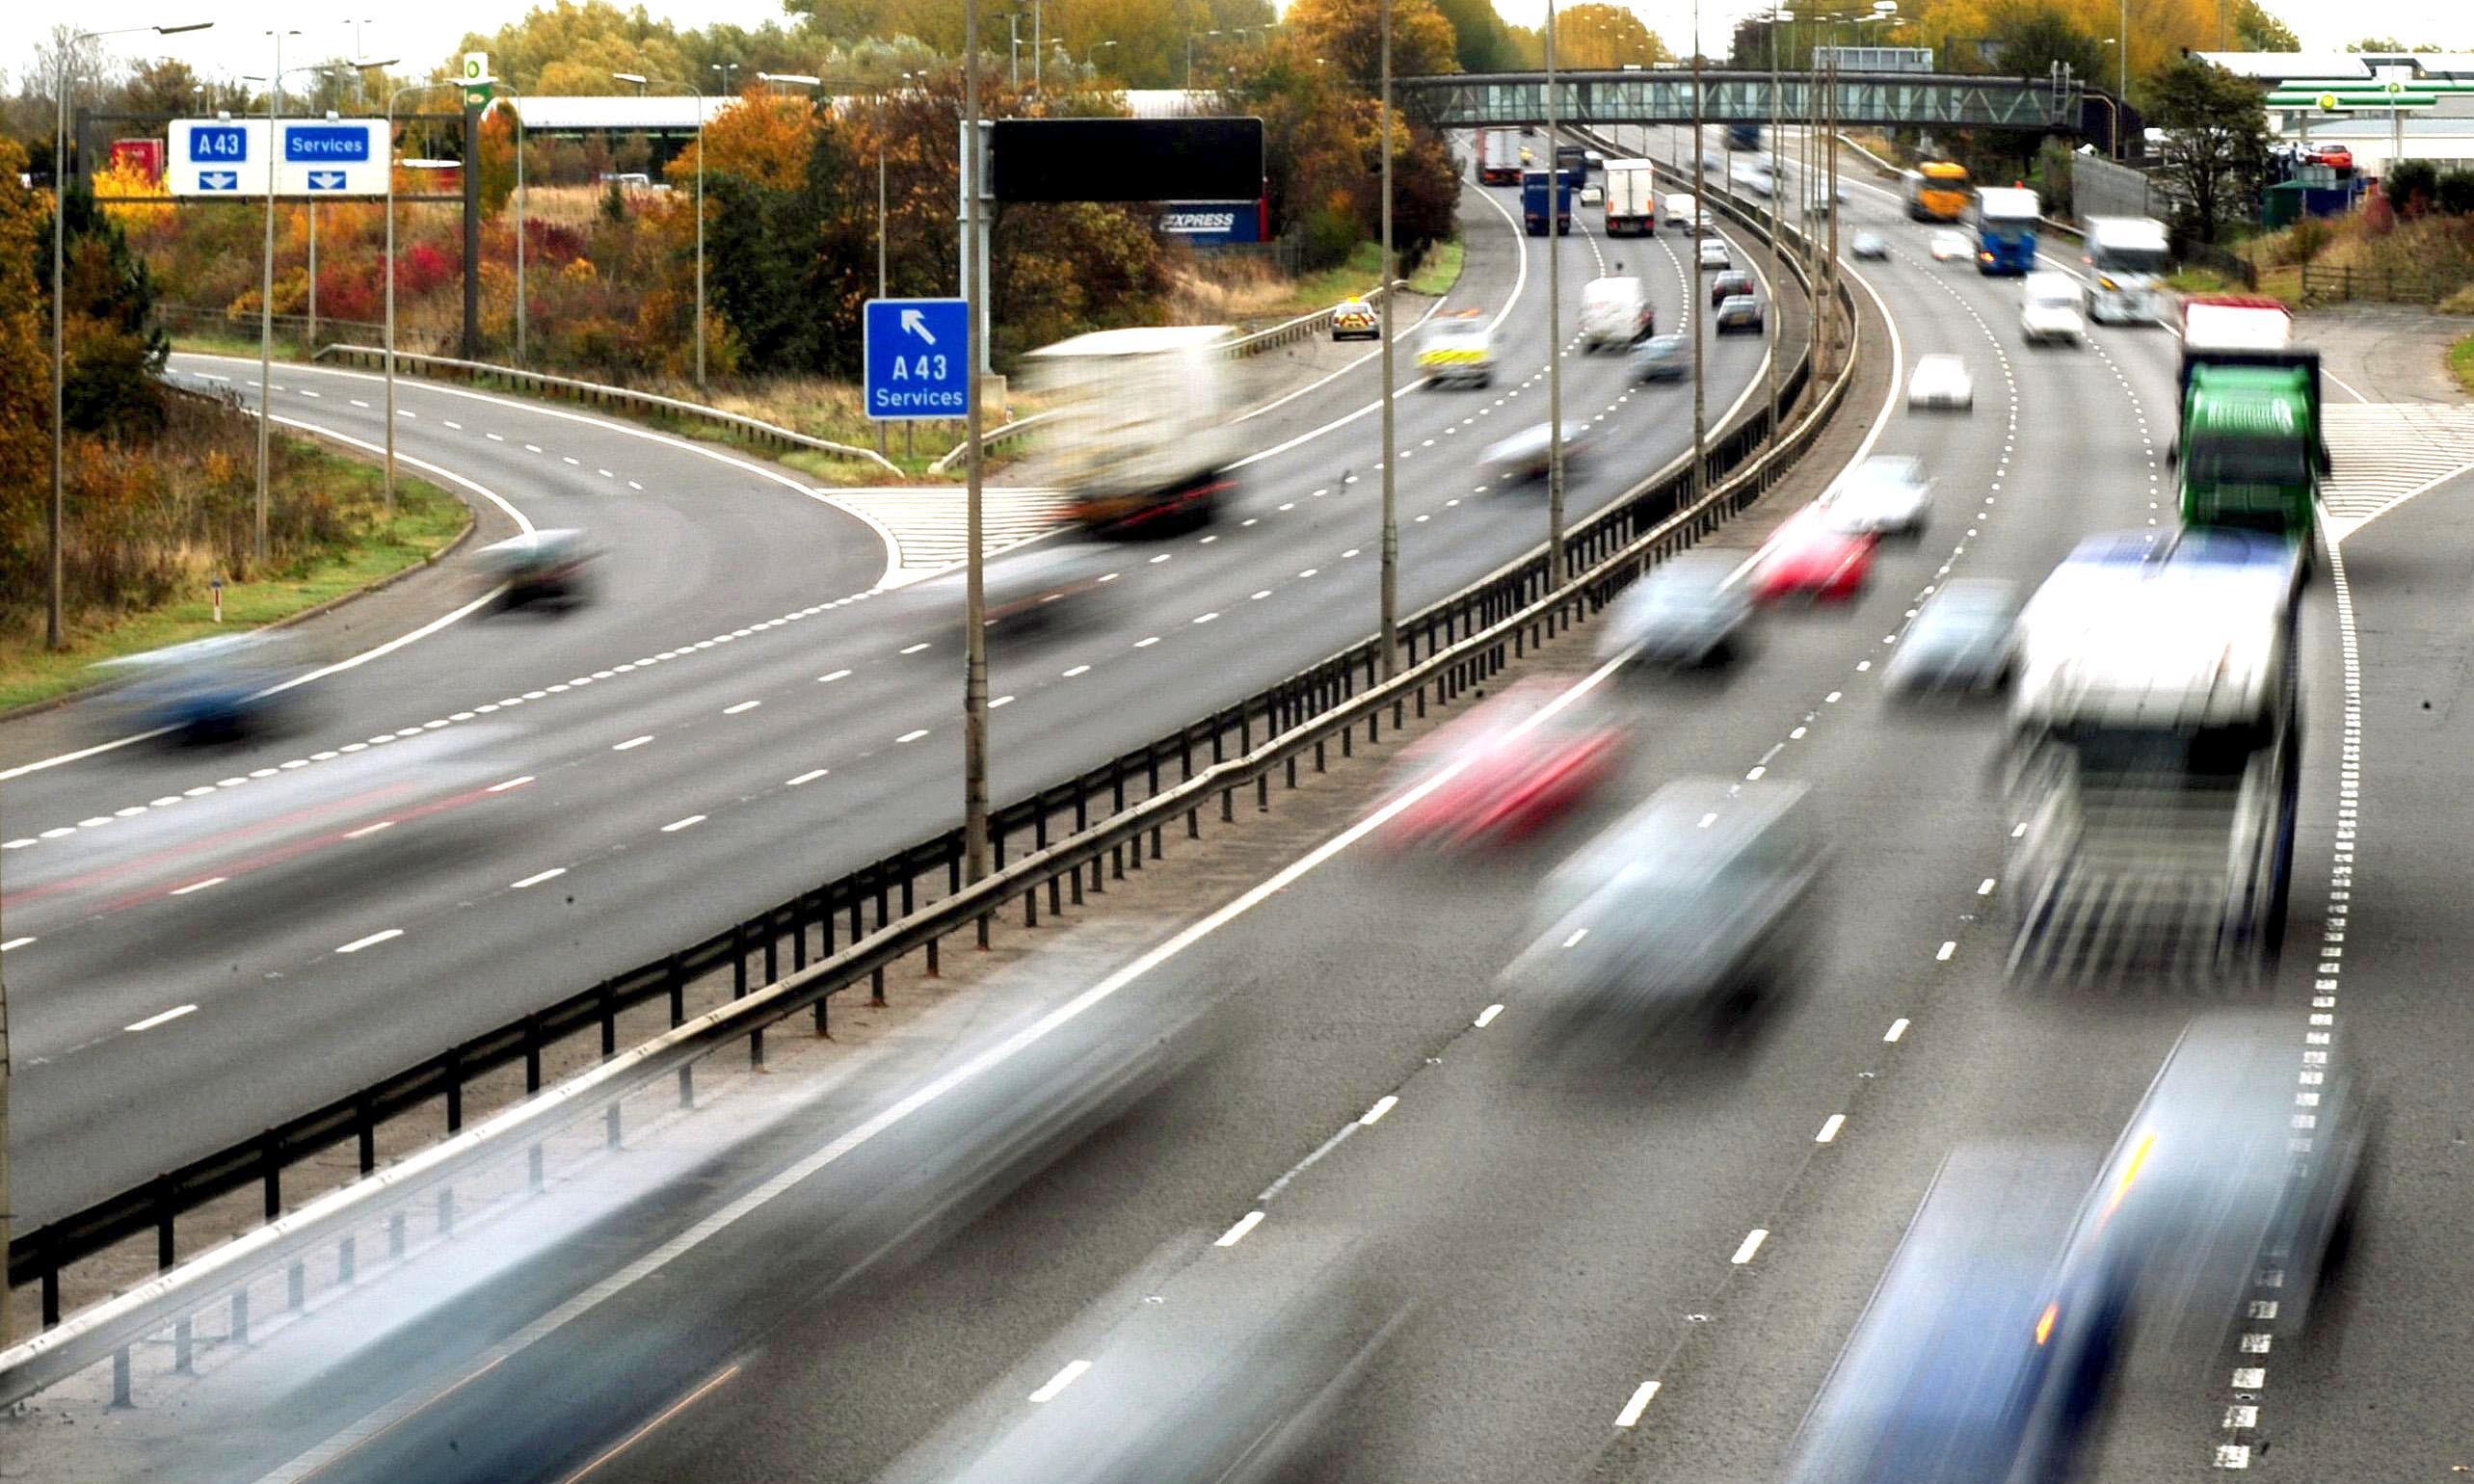 Bury bodies along UK's motorways to ease burial crisis, expert suggests